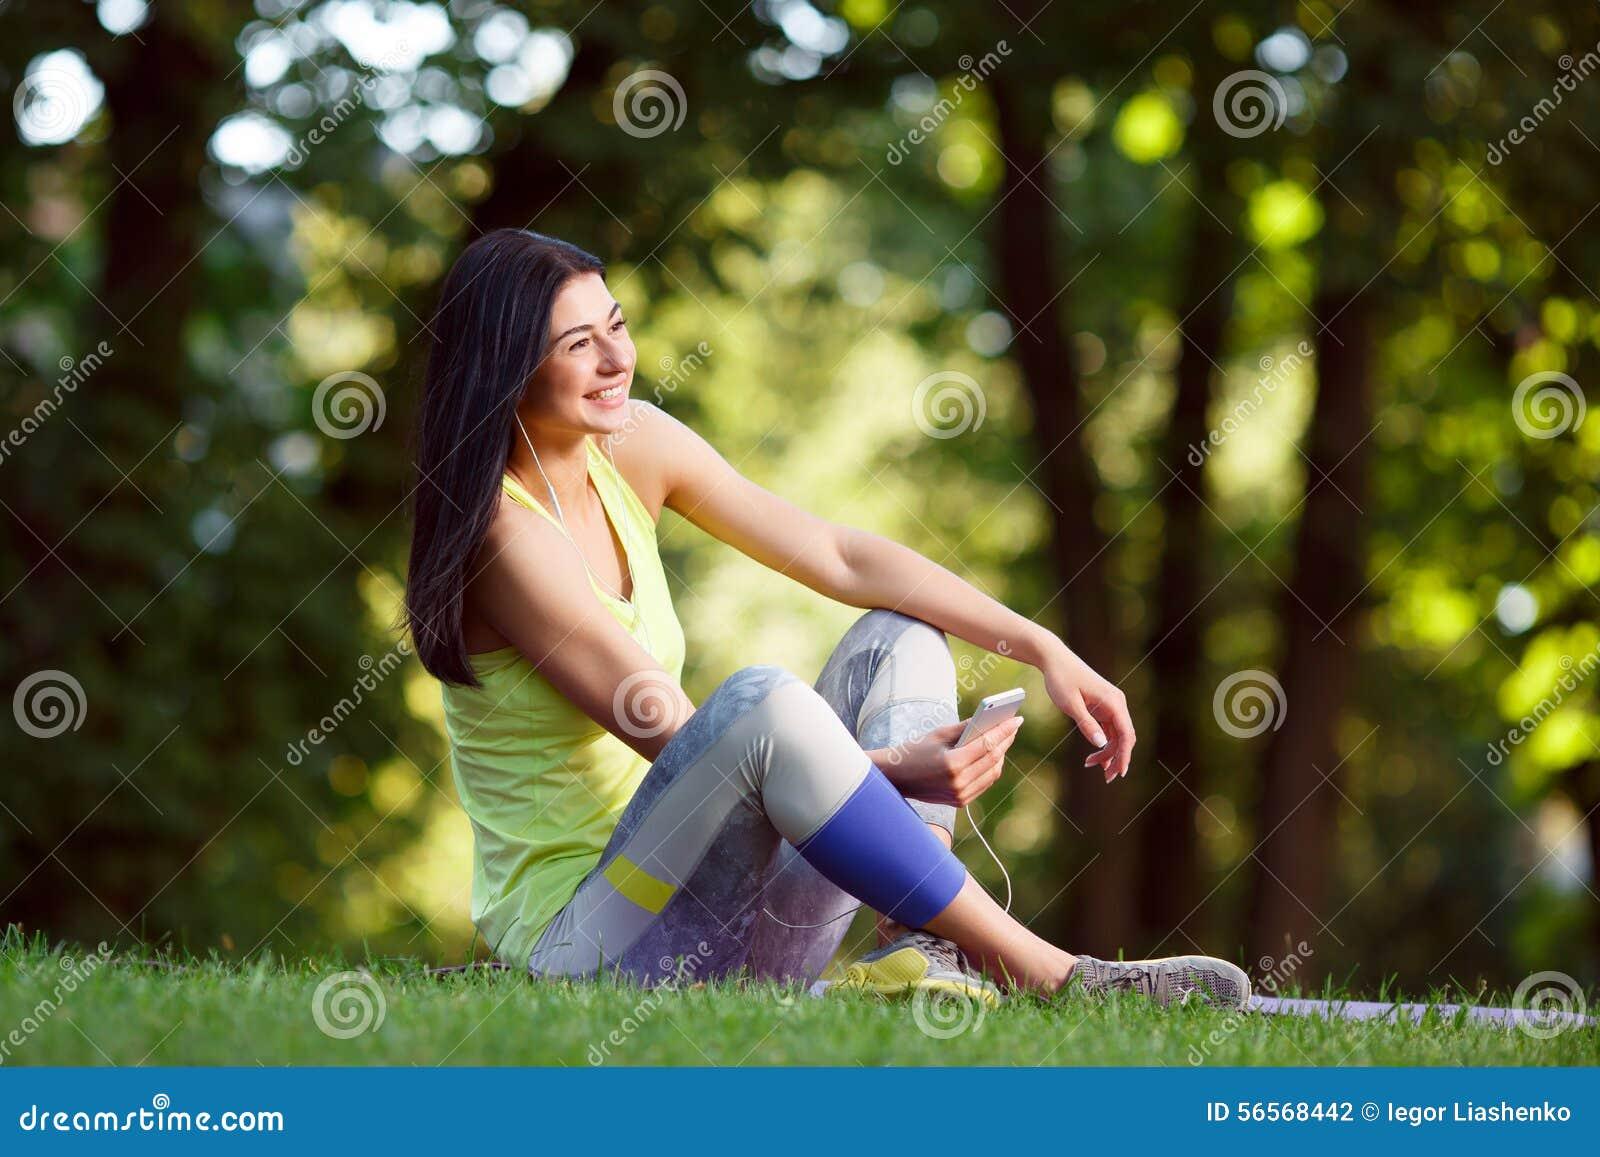 Download Εύθυμη αθλητική γυναίκα στοκ εικόνες. εικόνα από κύτταρο - 56568442